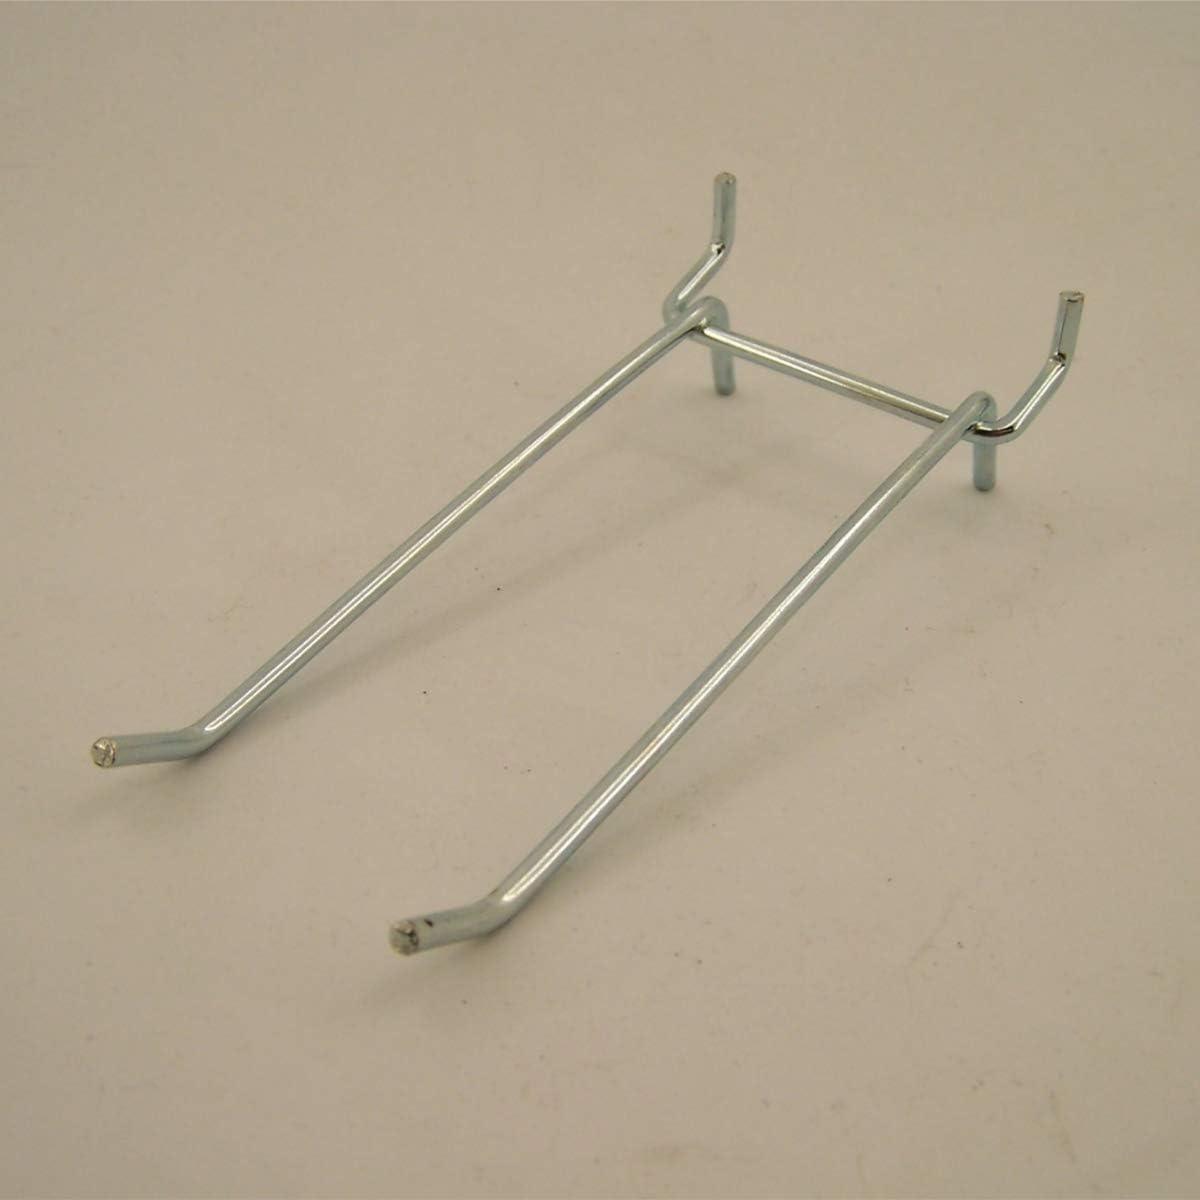 Dicoal b263s4//–/Set ganci doppio 100/mm, blister 4U